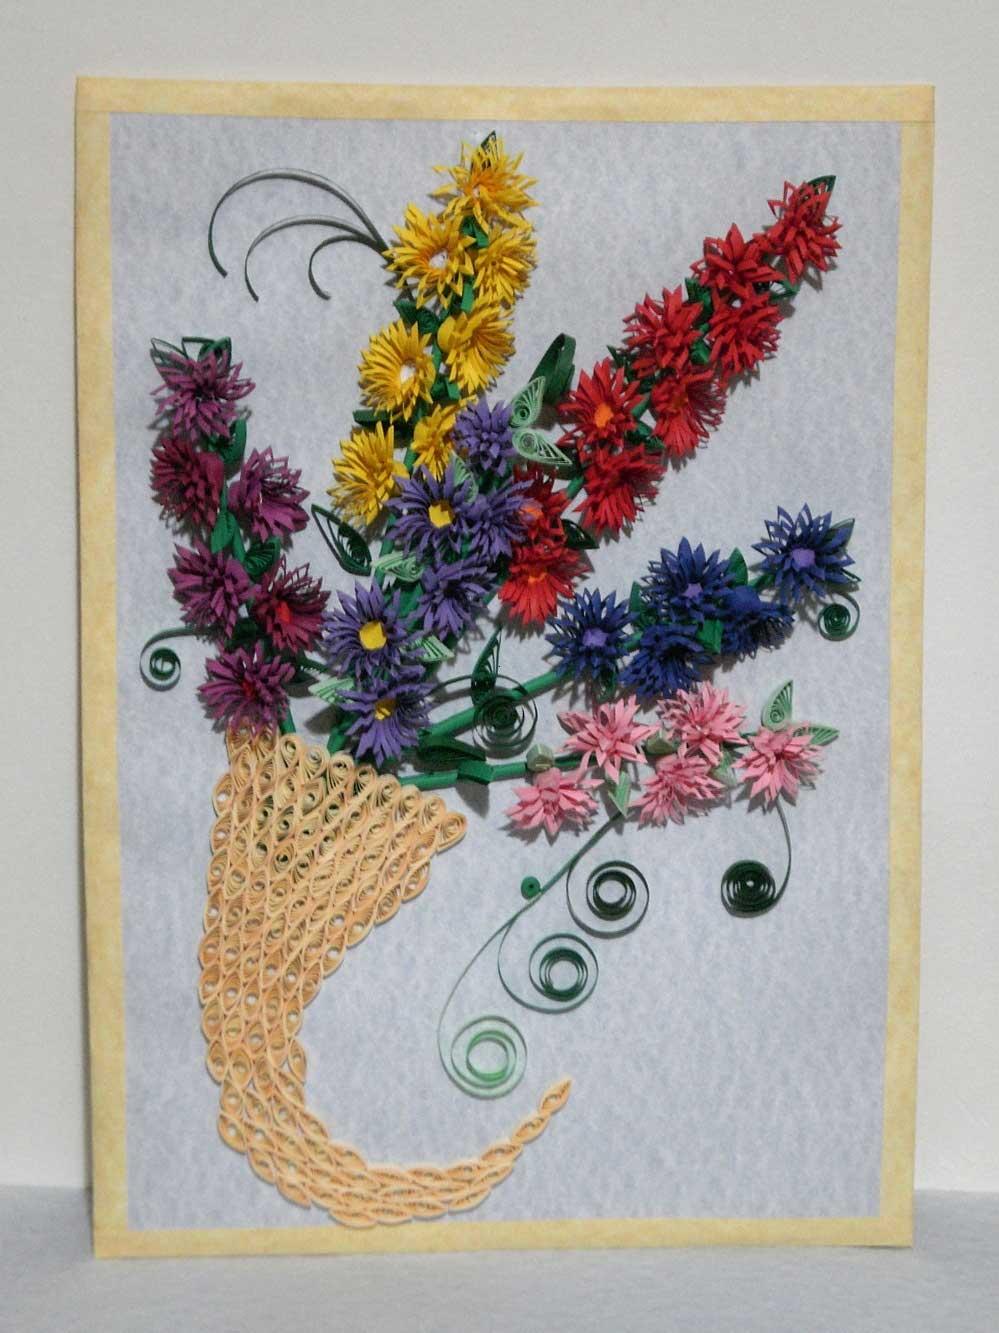 Квиллинг картинки схемы цветов 8